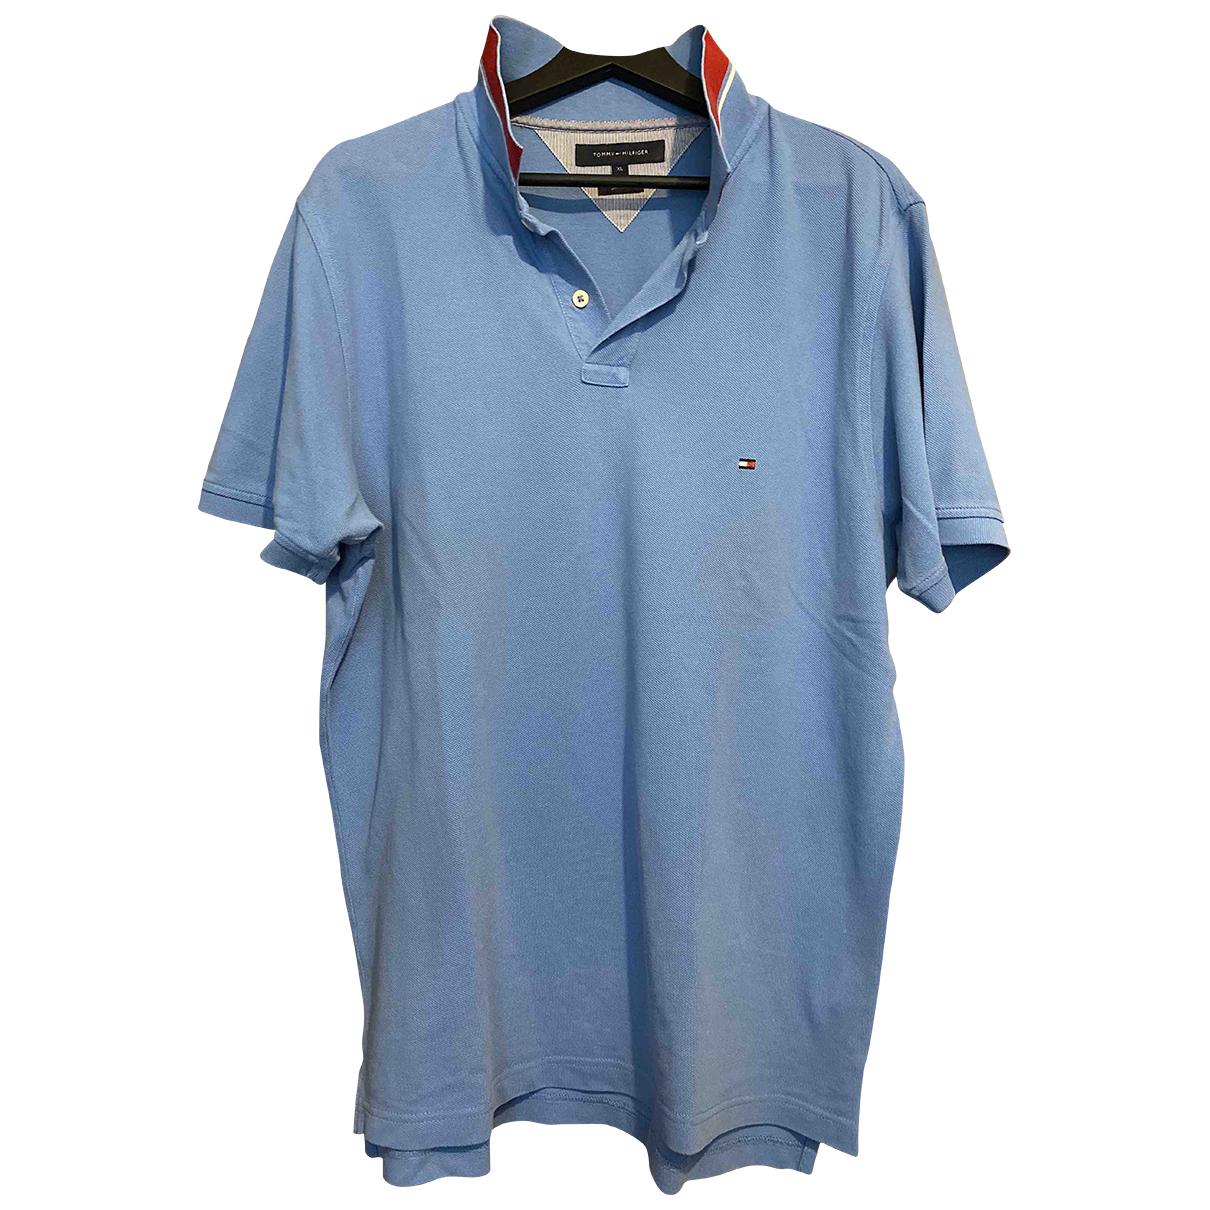 Polo en Algodon Azul Tommy Hilfiger